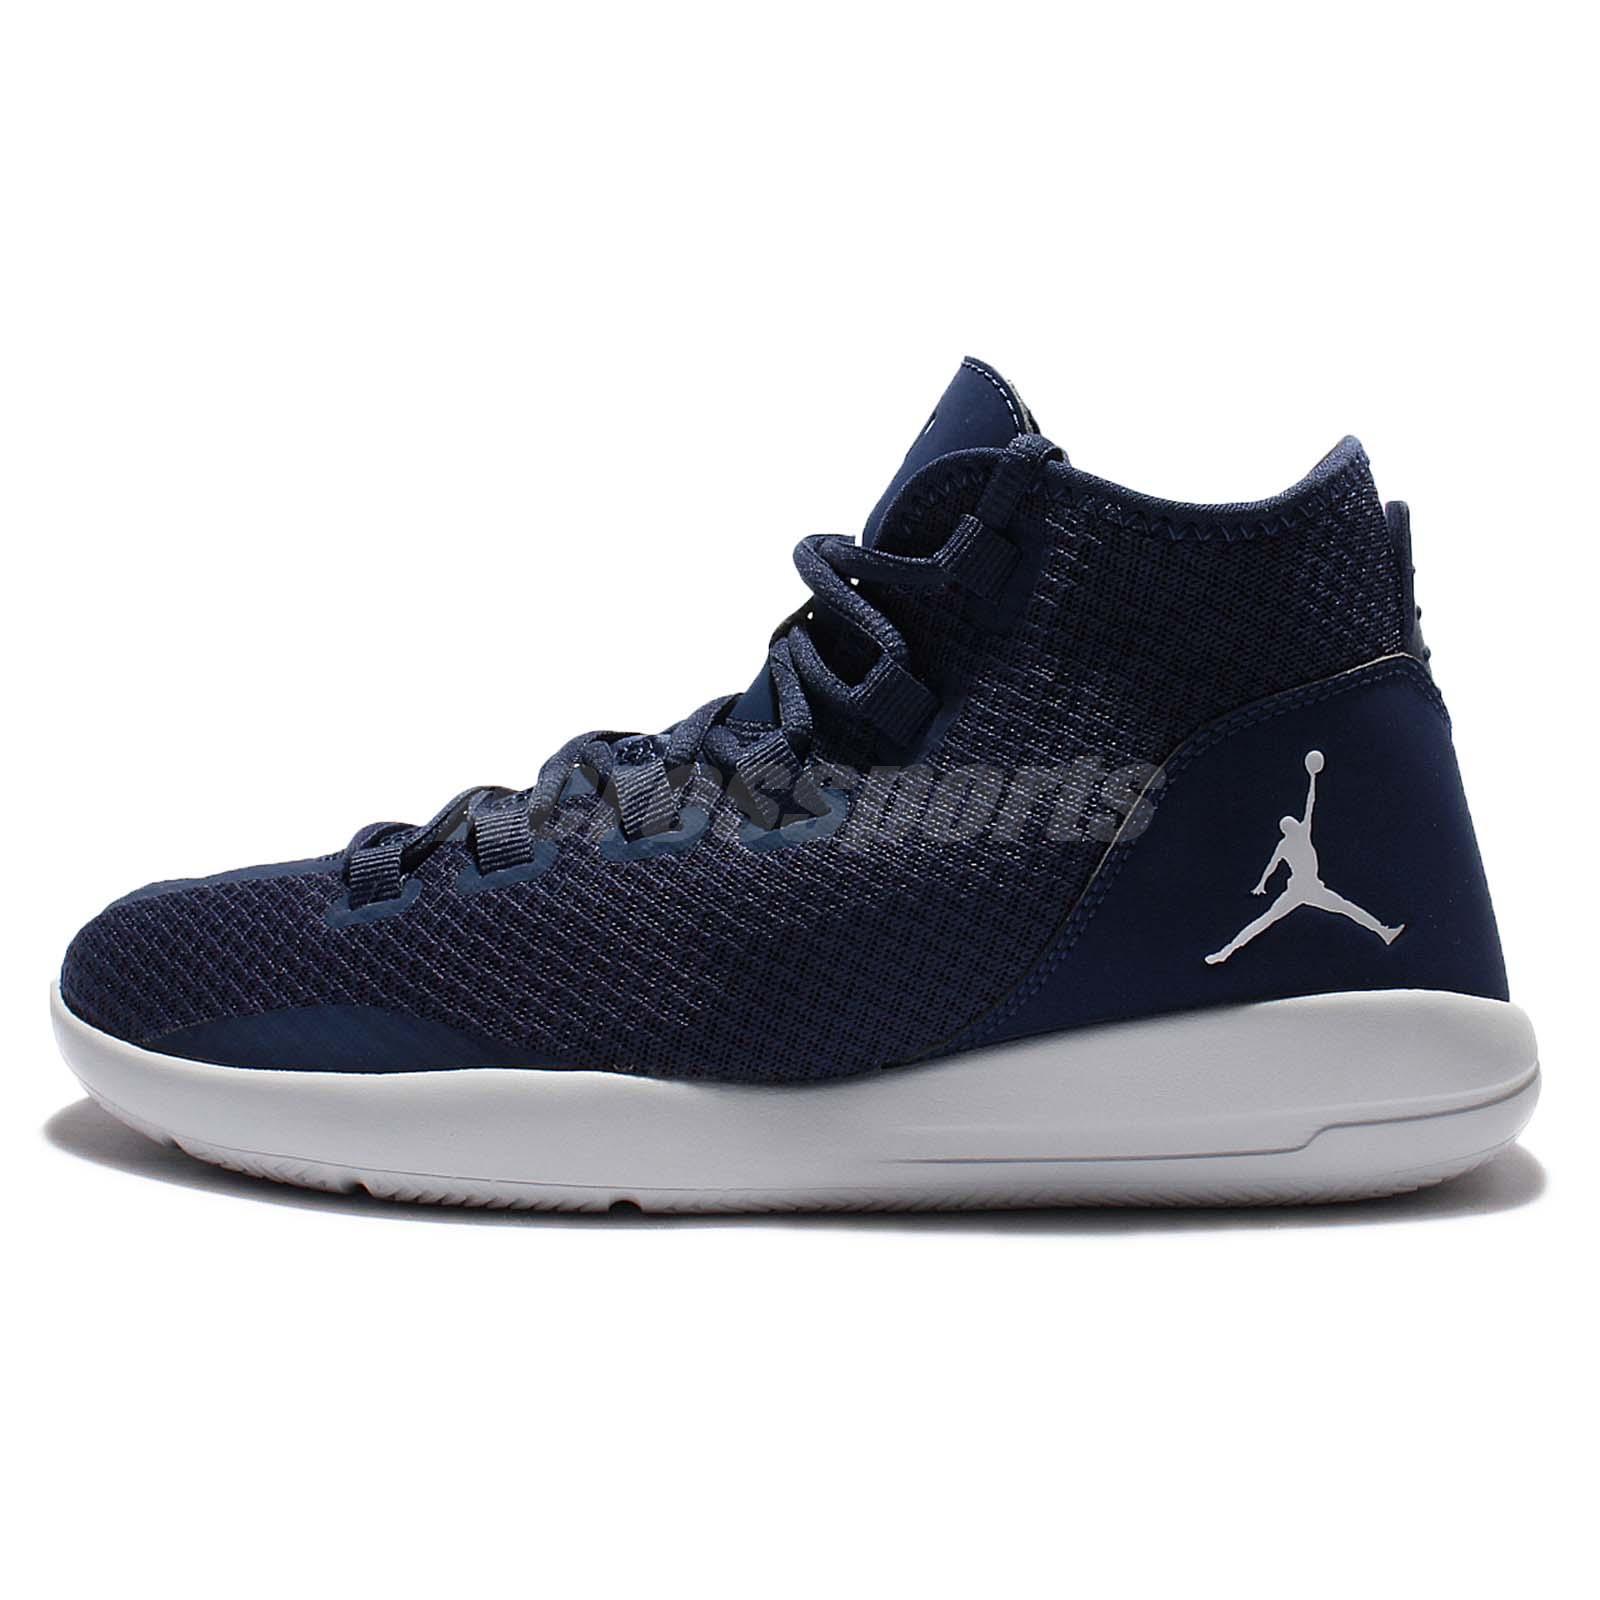 new concept 96def 10d1c ... greece nike jordan reveal navy pure platinum mens casual shoes air sole  834064 402 cbaad 0d6c3